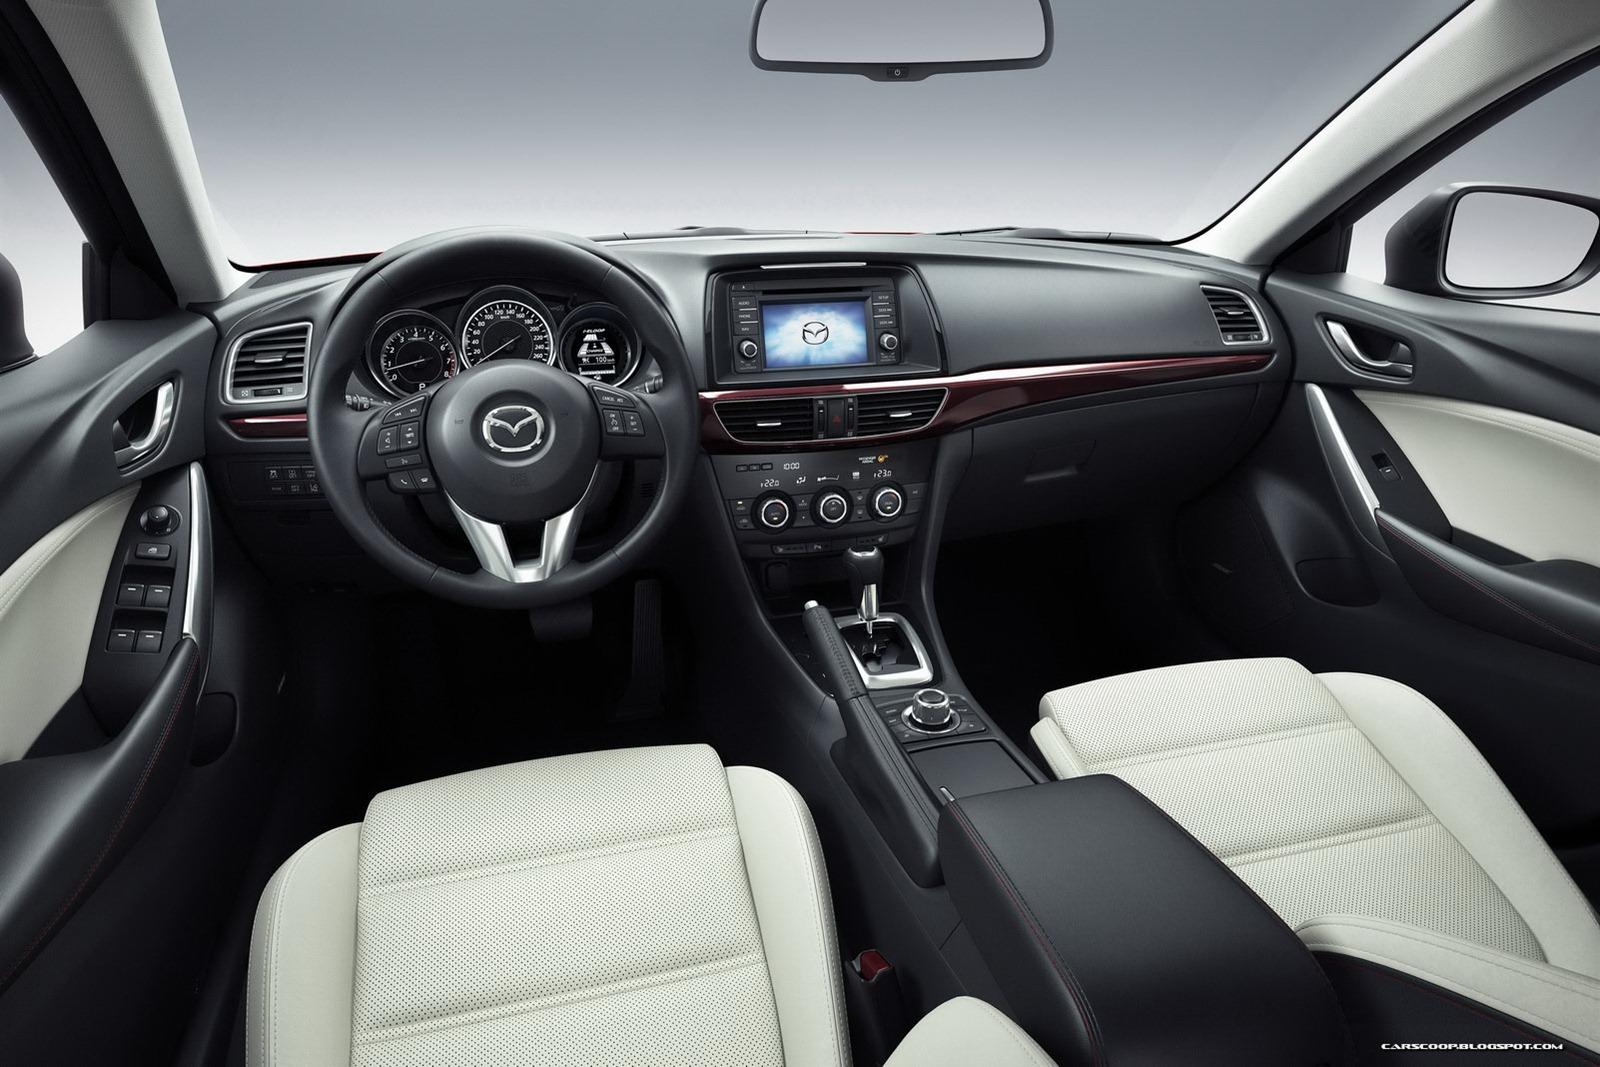 Mazda 6 Interior: Honda Accord Interior: